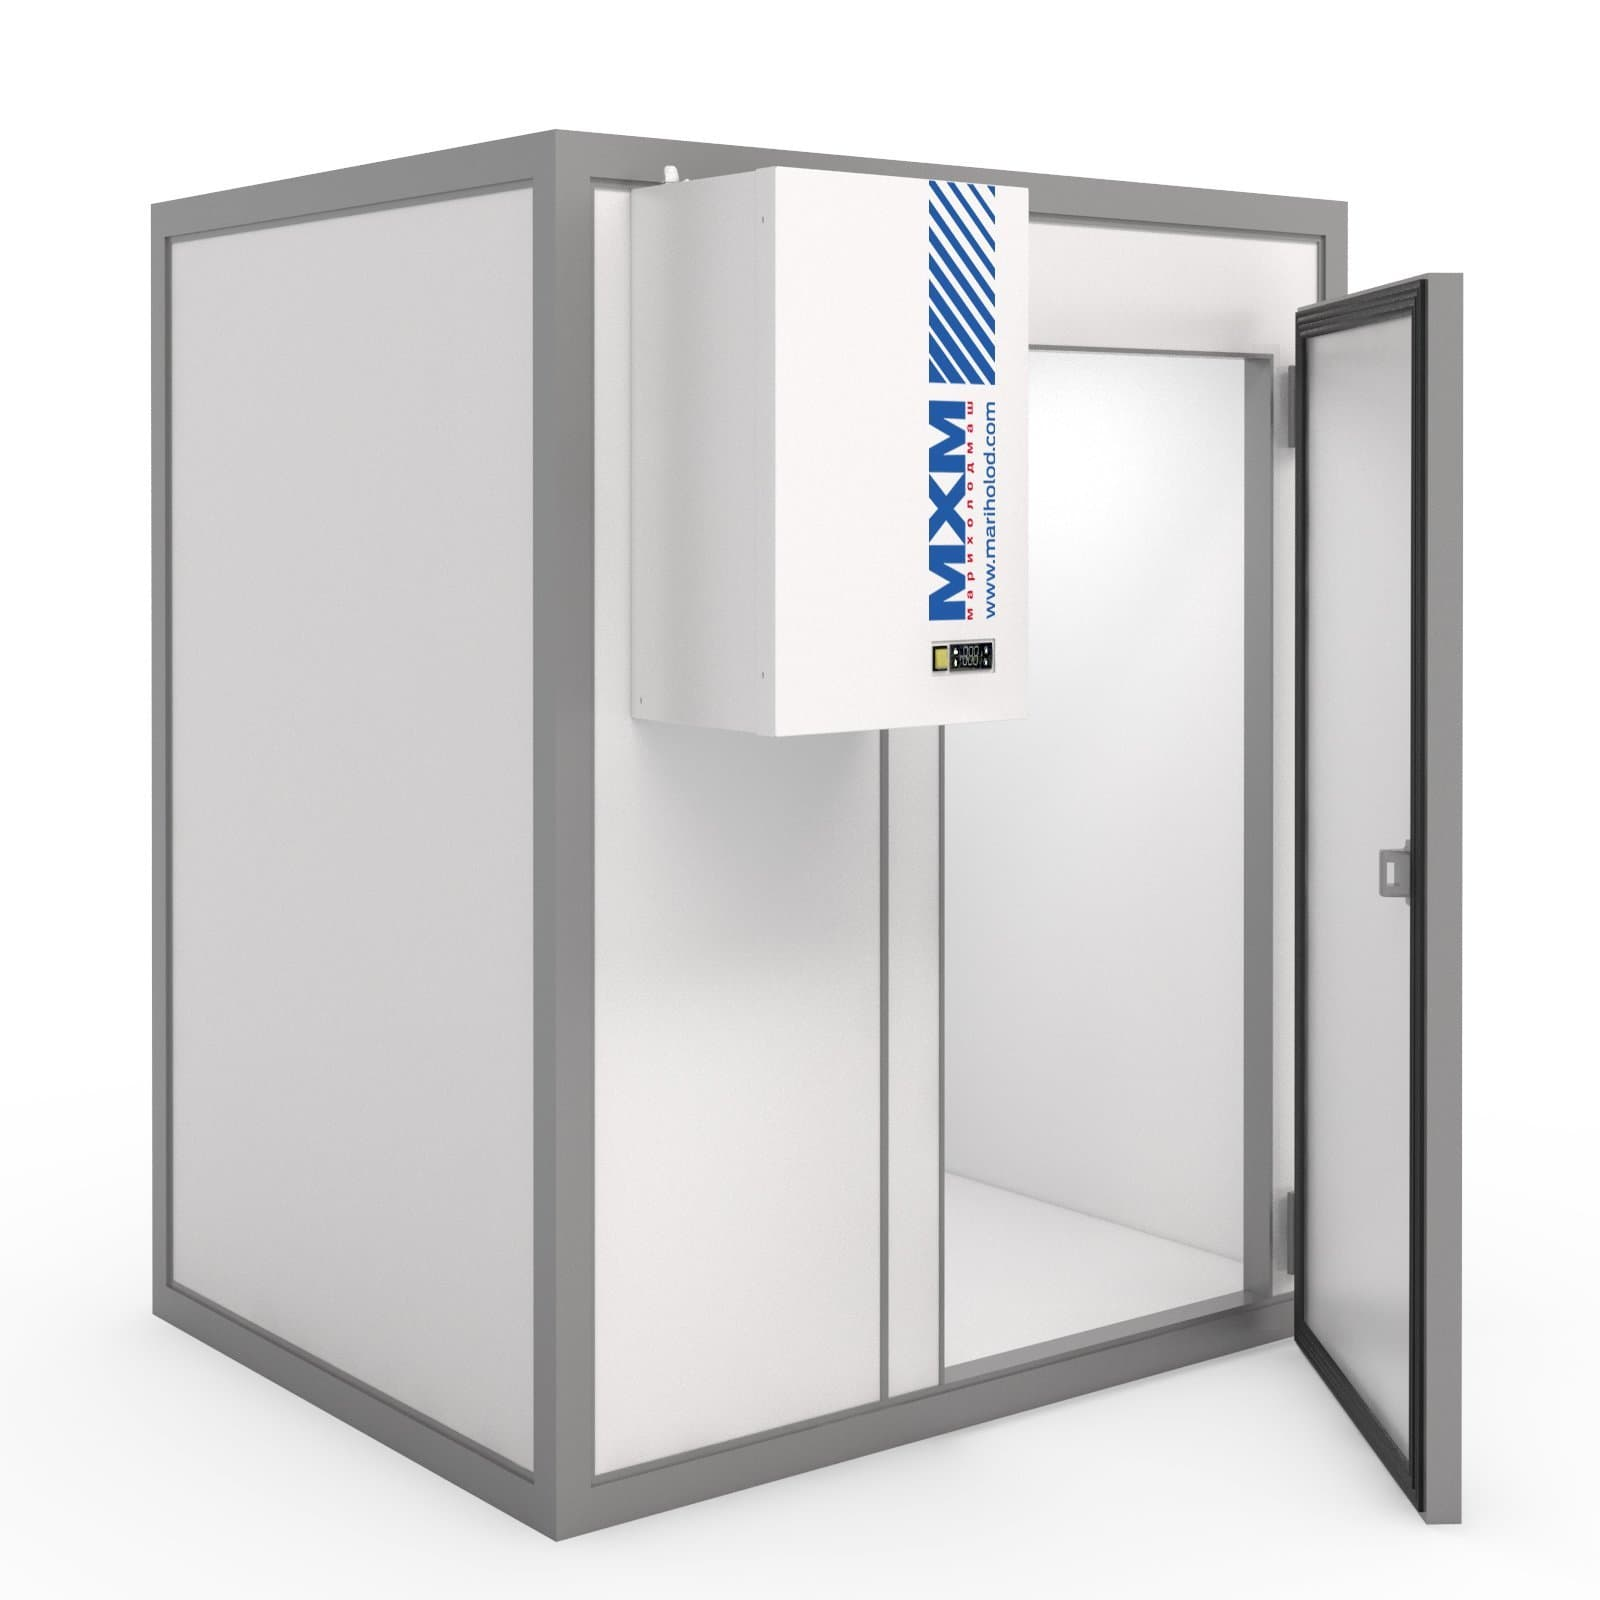 Камера холодильная МХМ КХН-38,71 1360×12760×2720